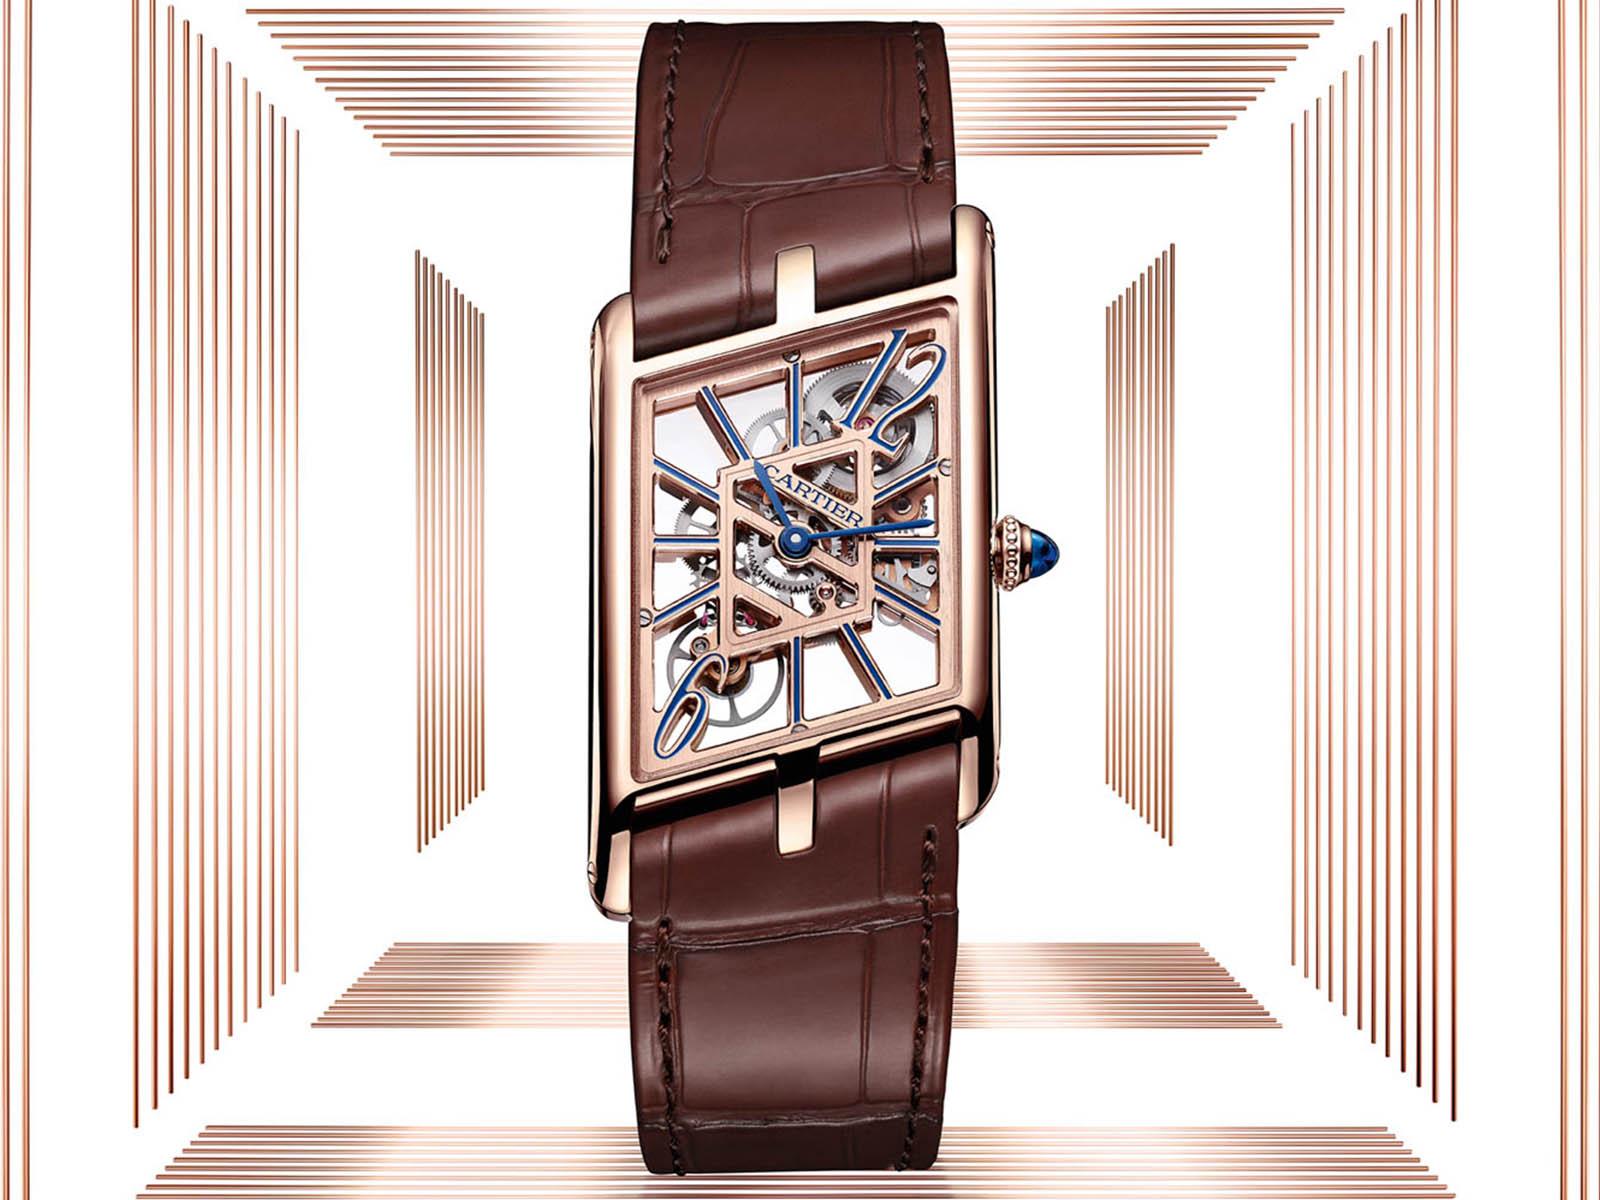 cartier-tank-asymetrique-skeleton-watches-wonders-2020-2.jpg